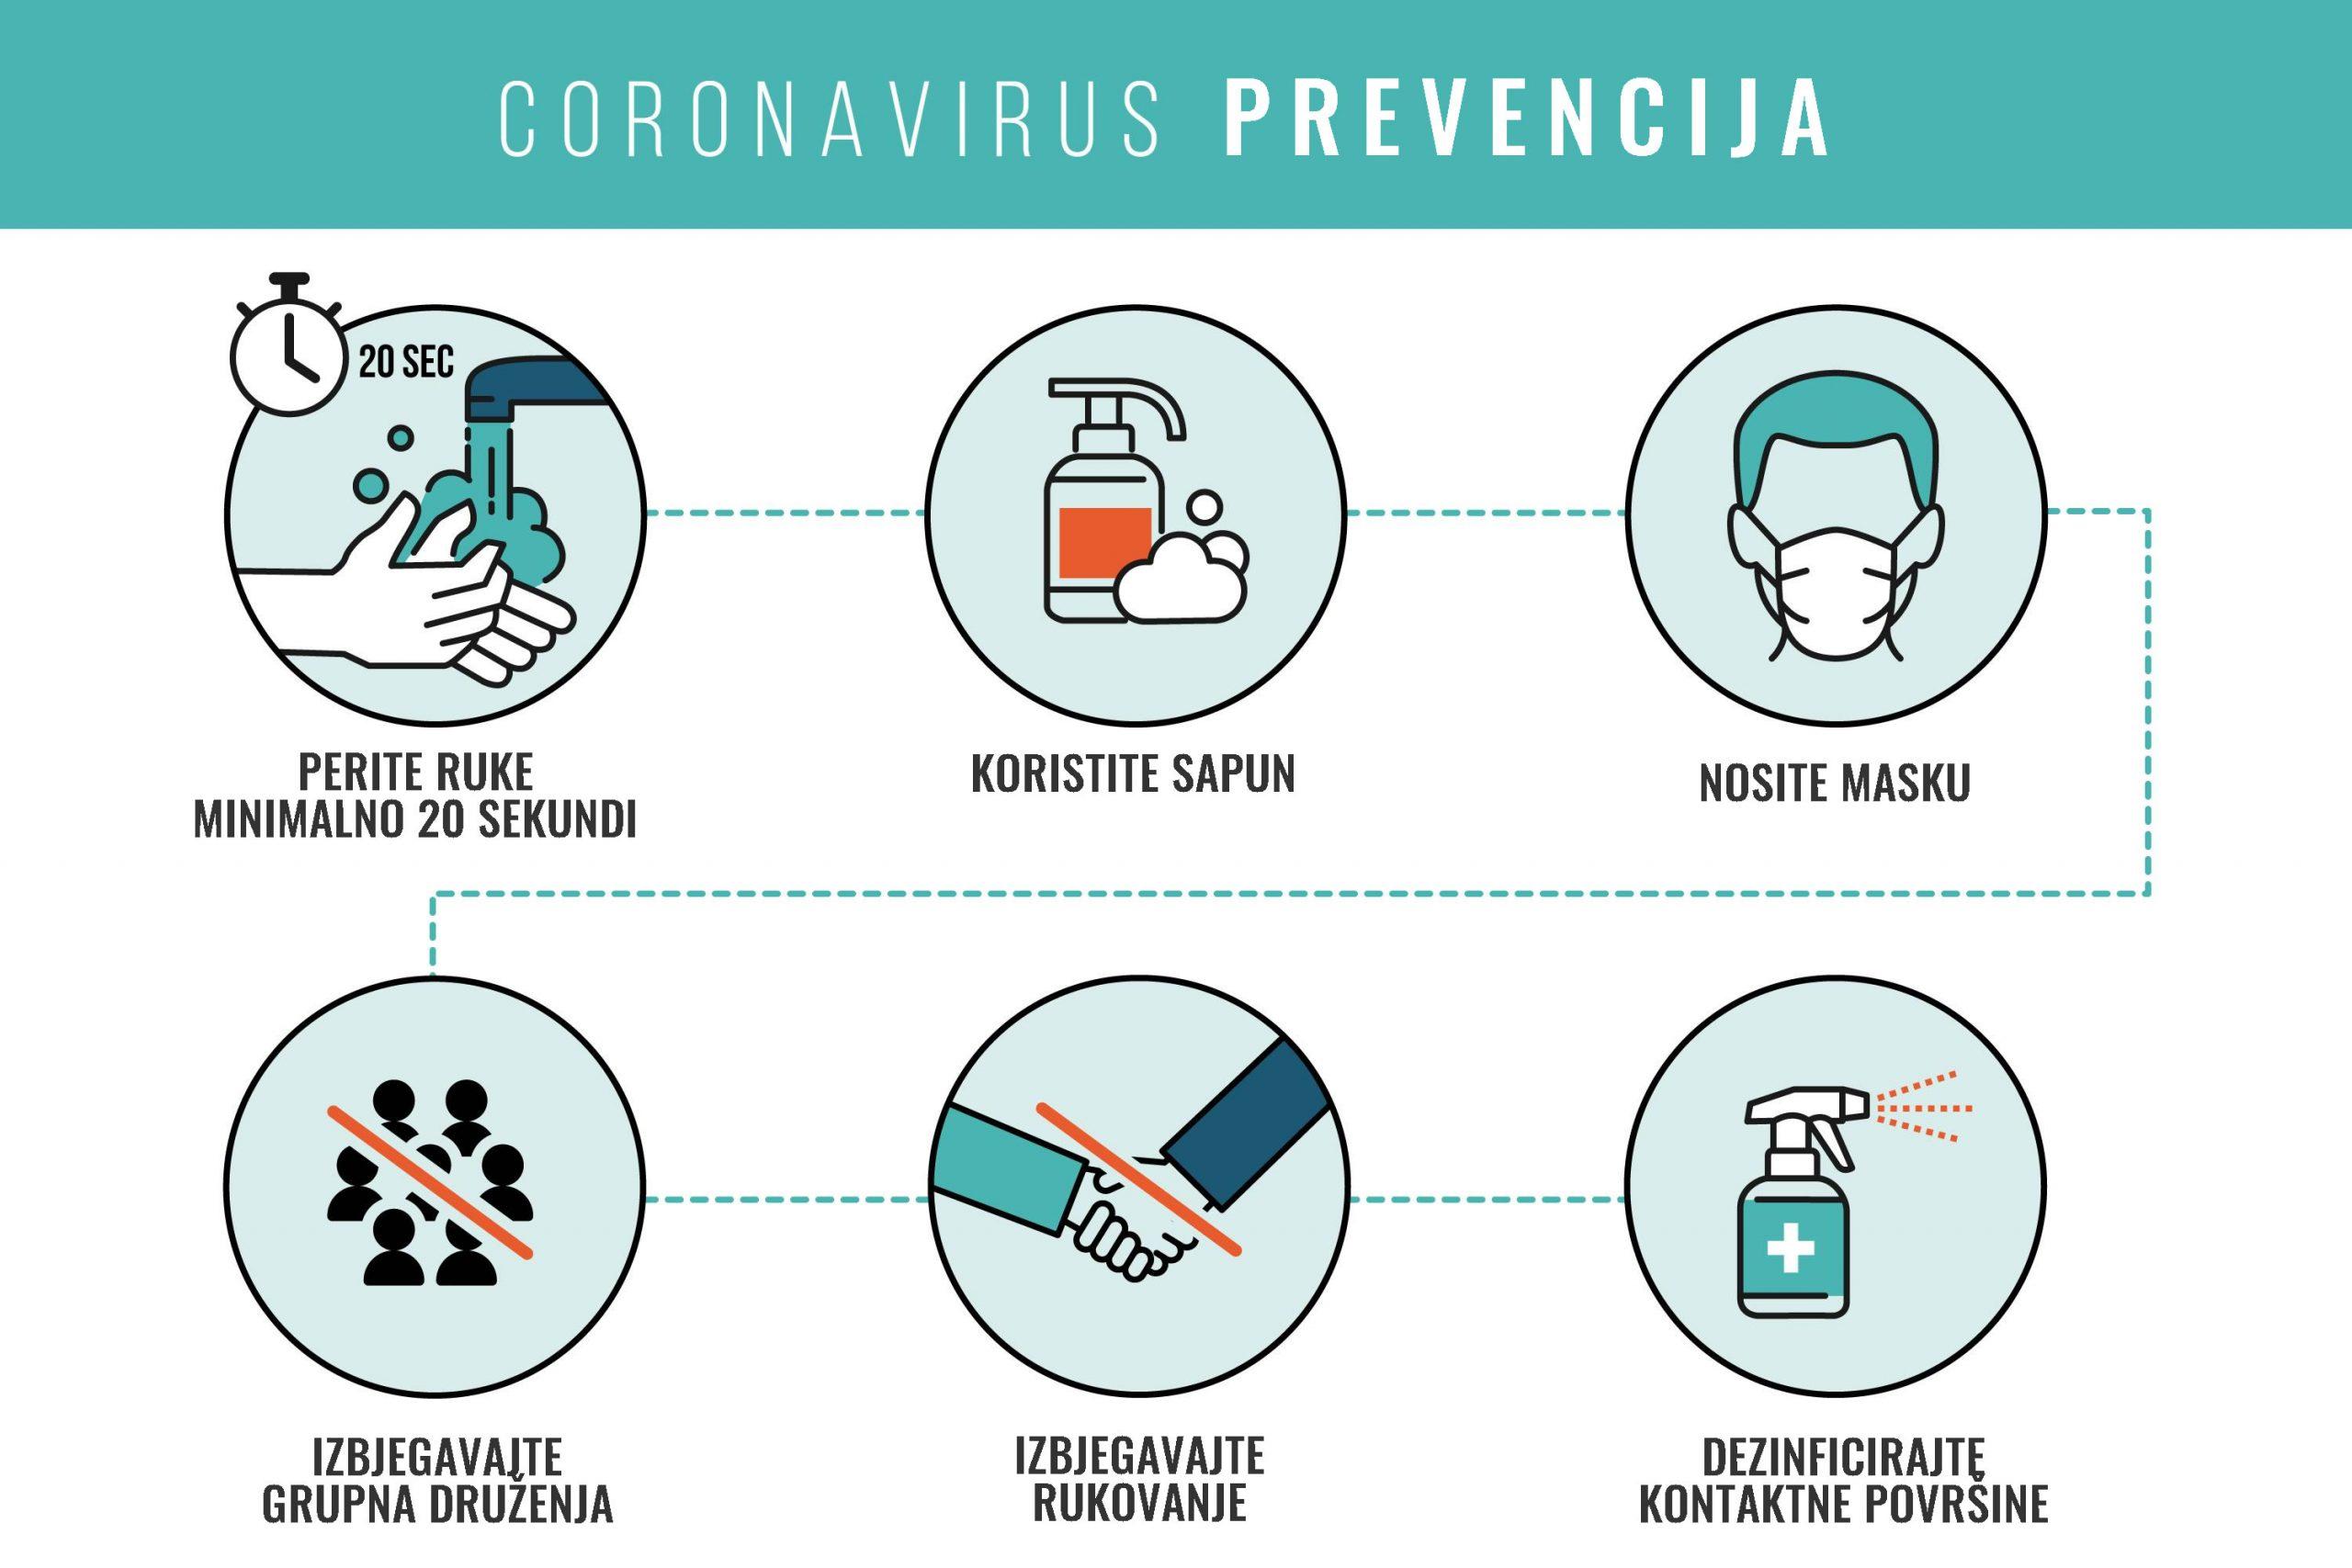 Coronavirus prevencija